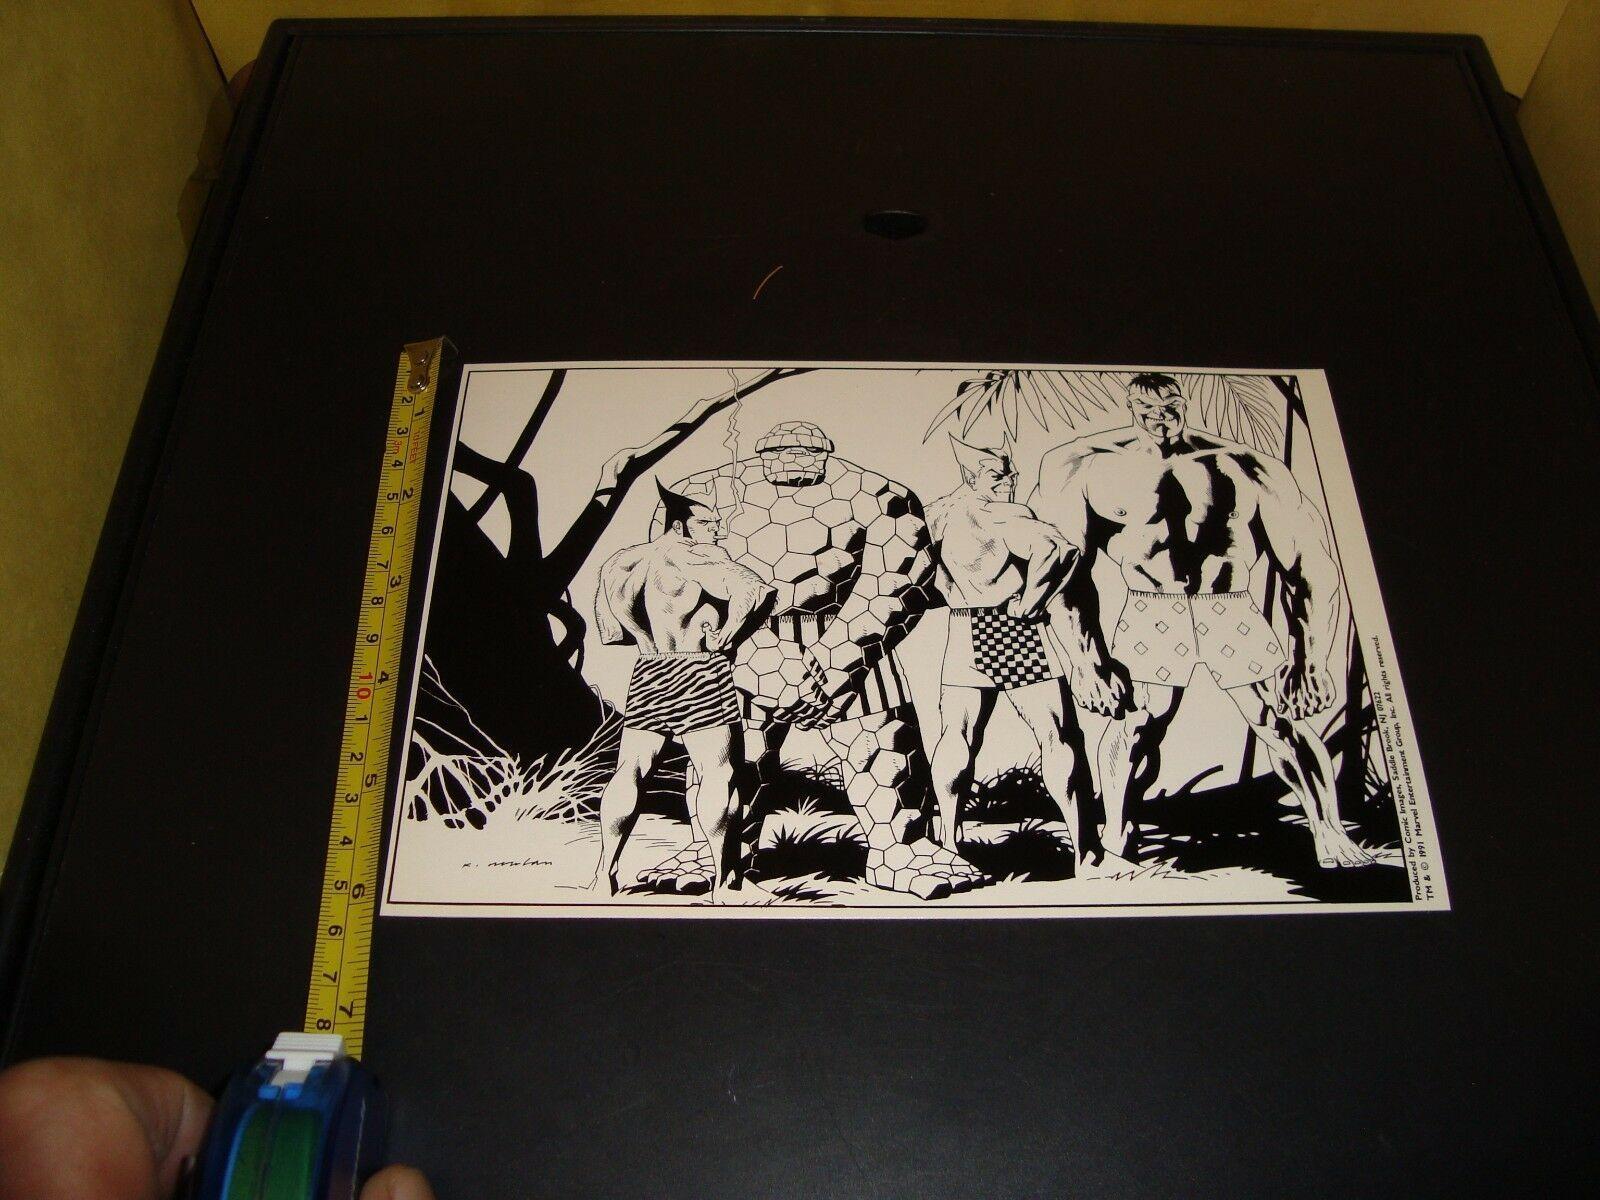 Keepsake 1991 Marvel Comic Book Keepsake Collection Numbered Proof Set Autograph